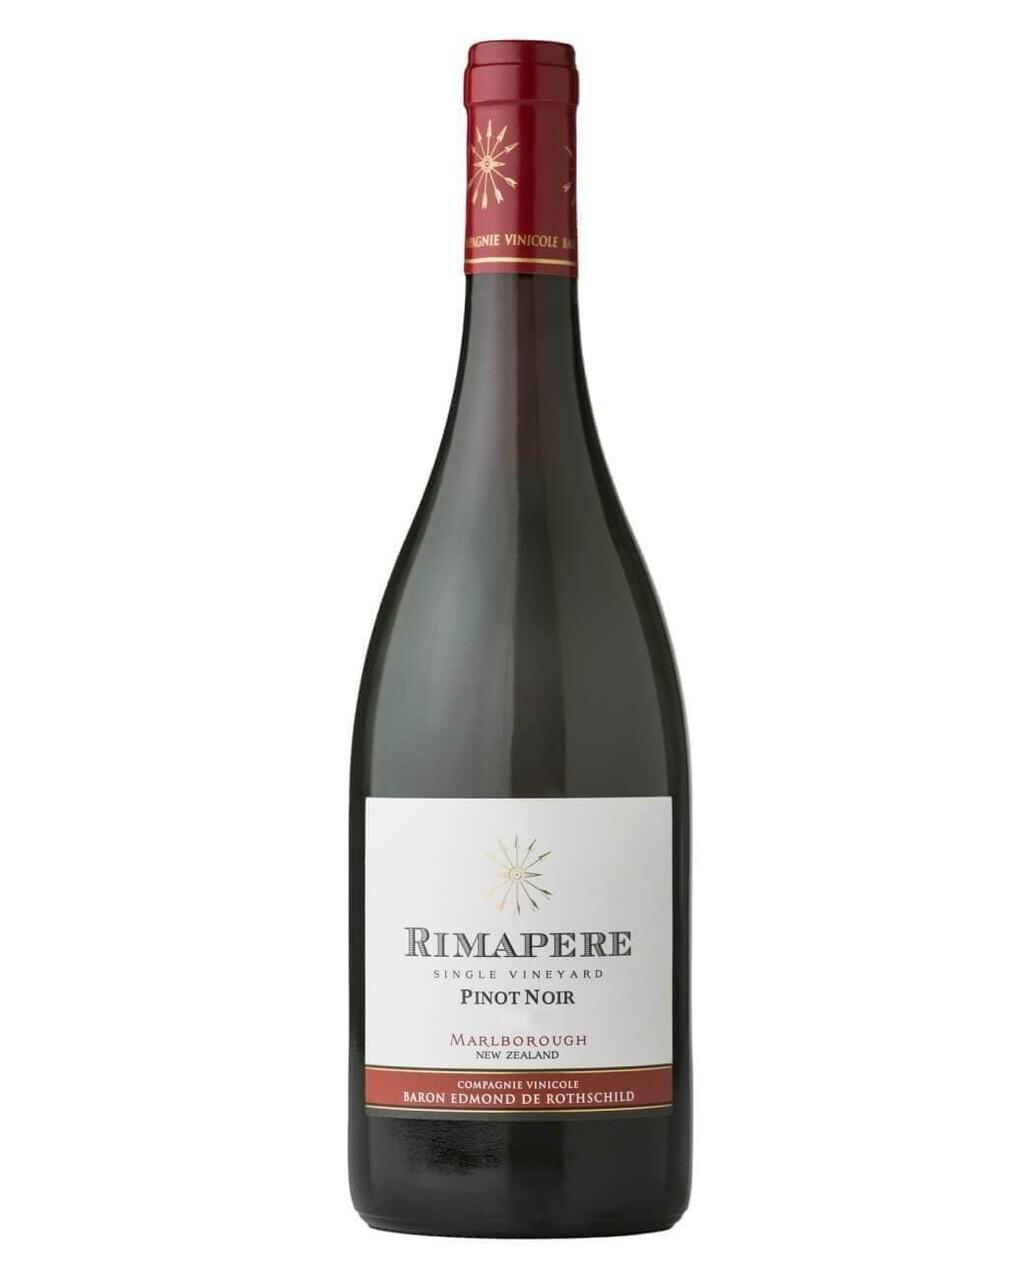 Baron Edmond de Rothschild Rimapere Pinot Noir